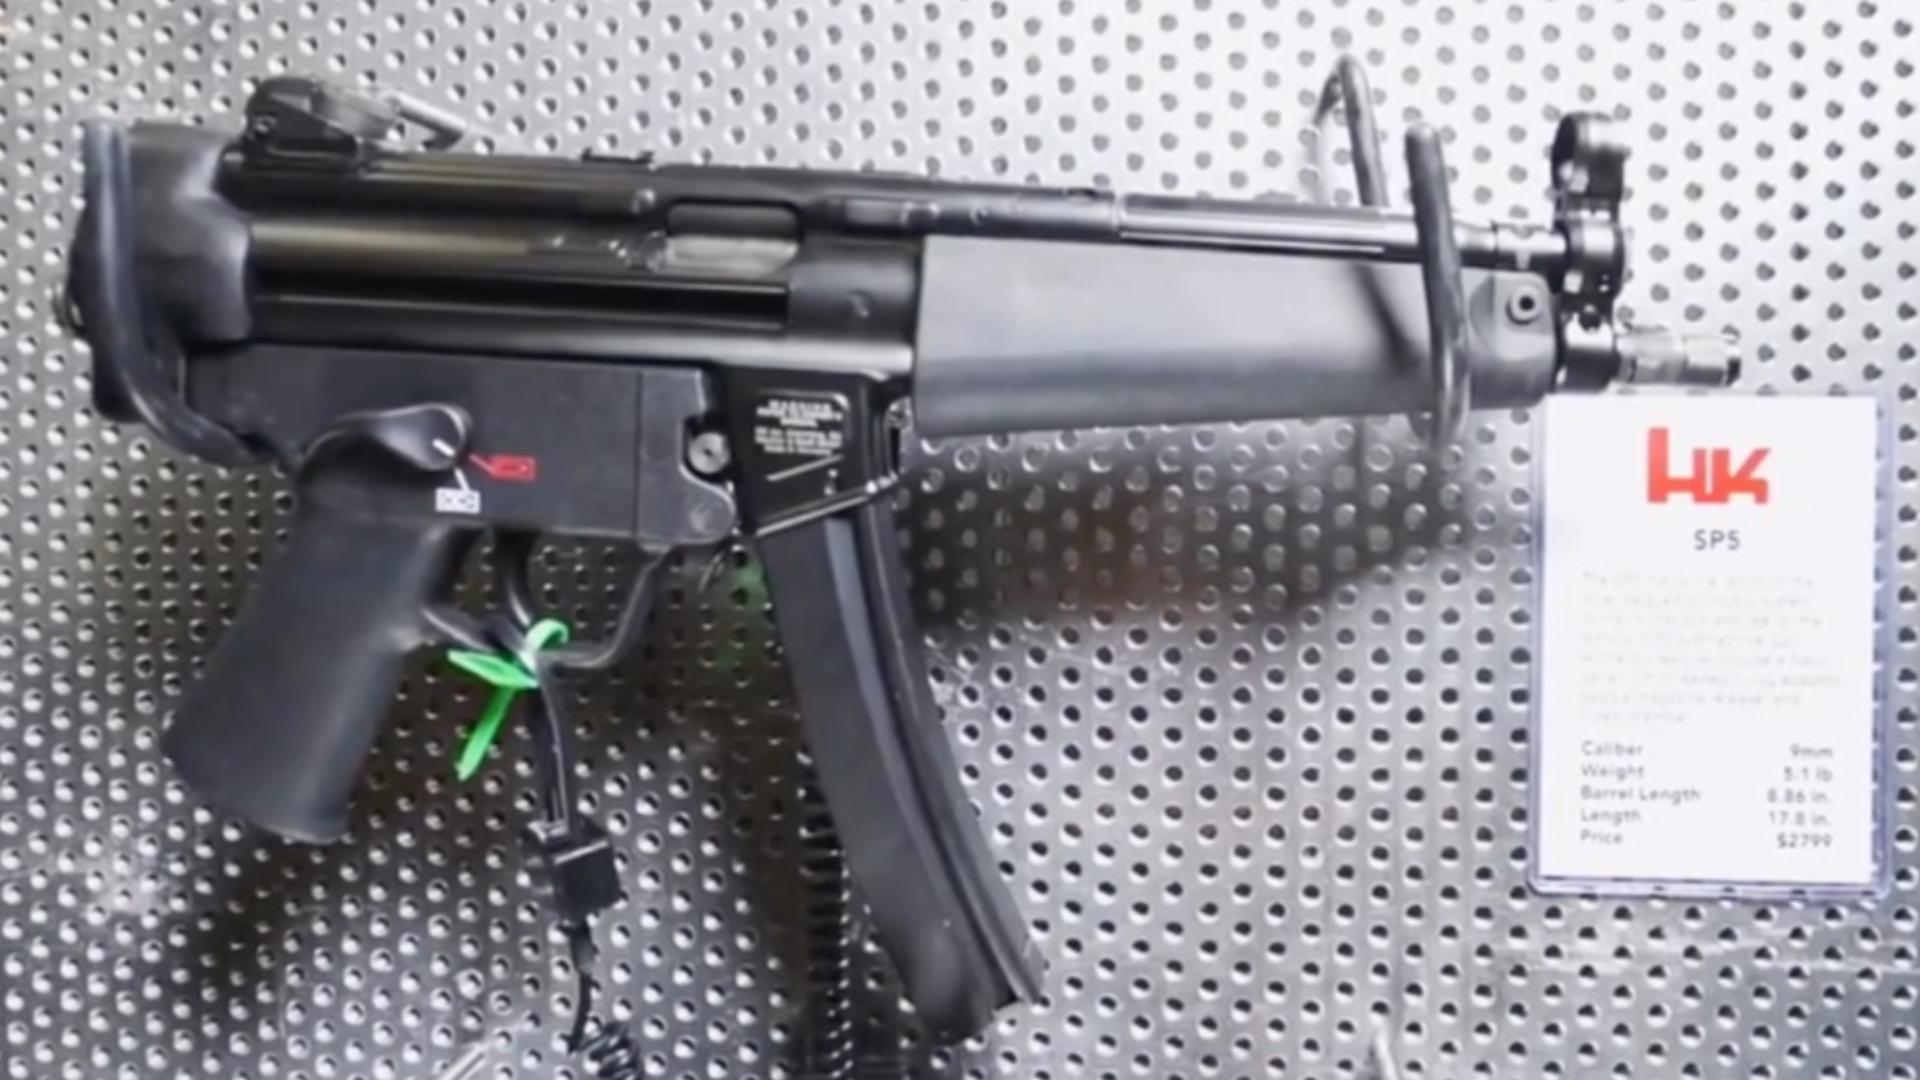 【VickersTactical(中文字幕)】ShotShow2020系列:HK SP5卡宾枪/手枪